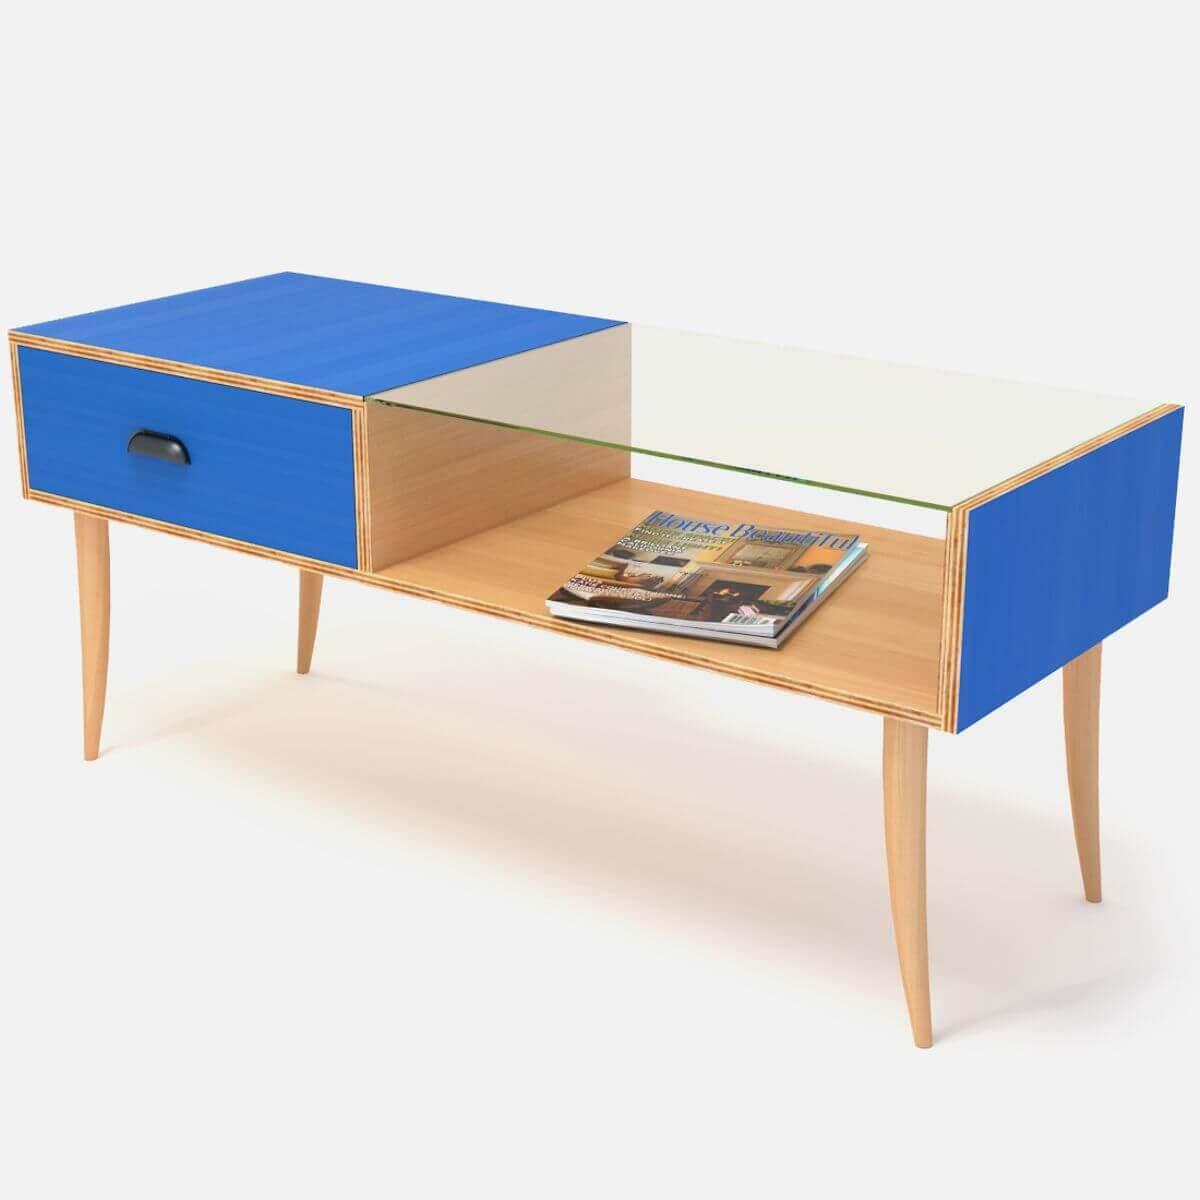 Retro Coffee Table Collect This Idea Coffee Table Retro Retro Coffee Table Retro Side Table Mid